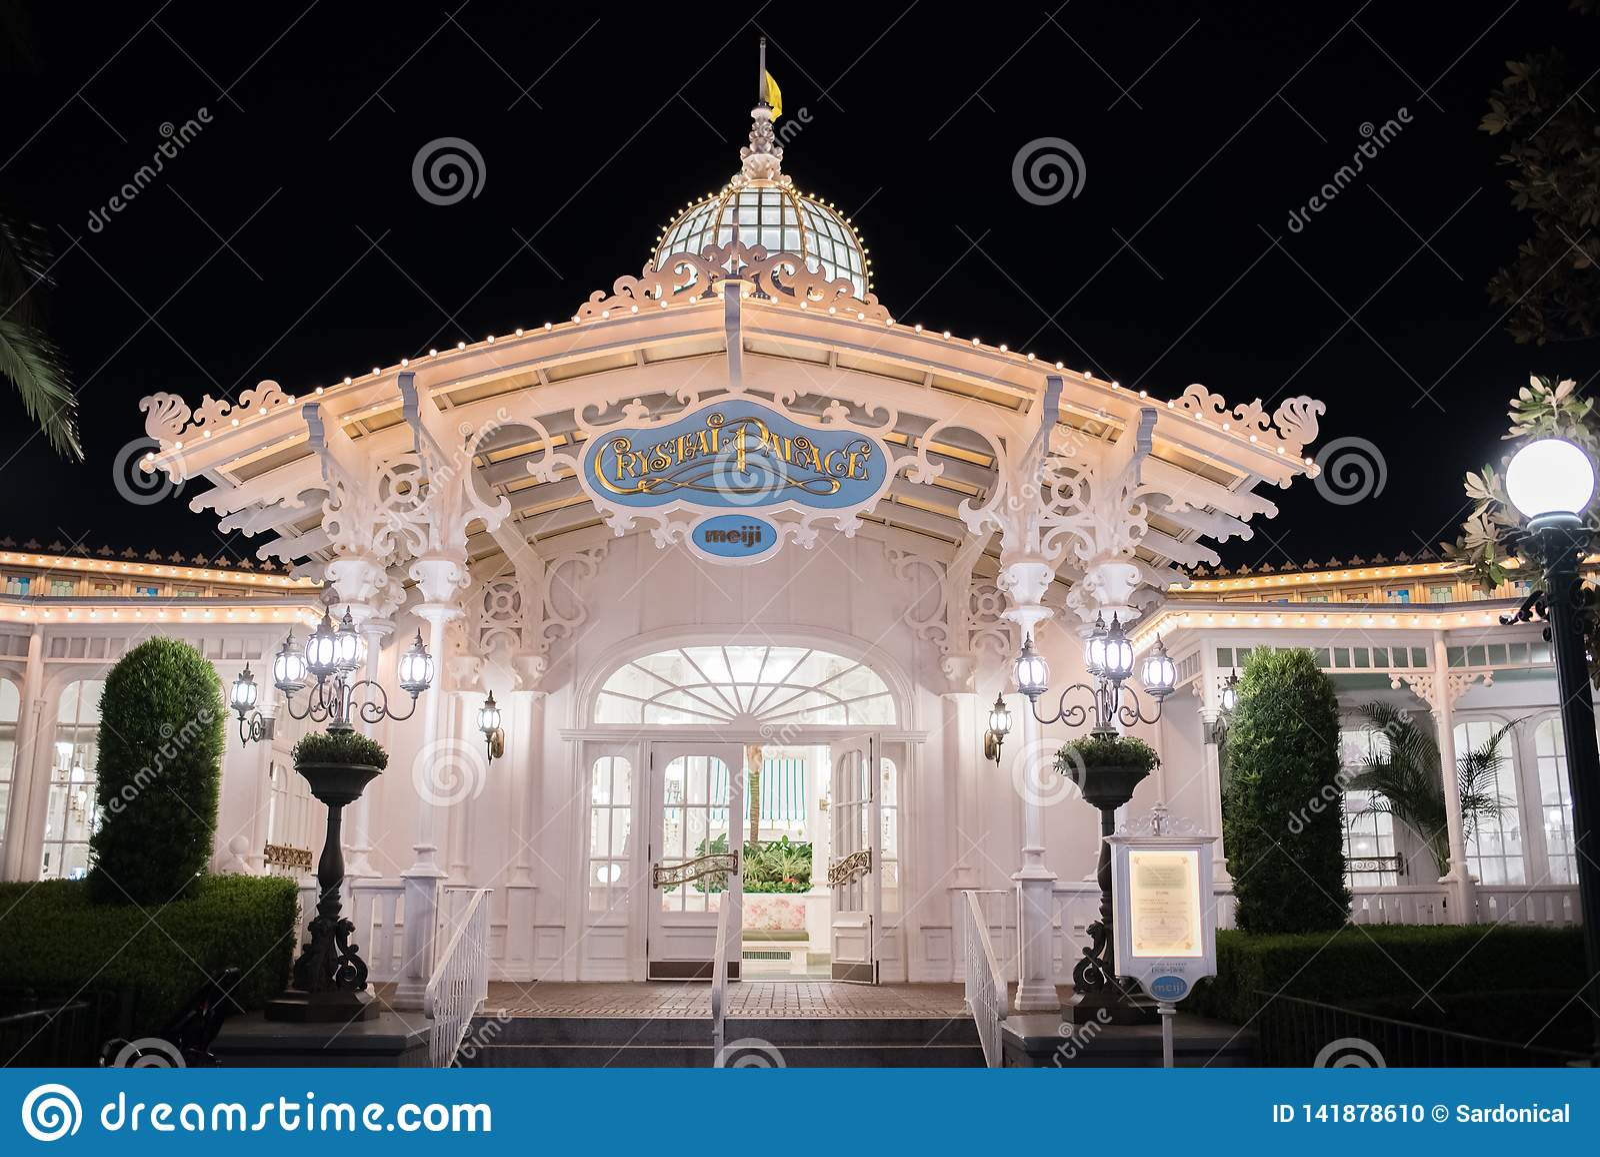 Tokio Disneyland Resort en Japón